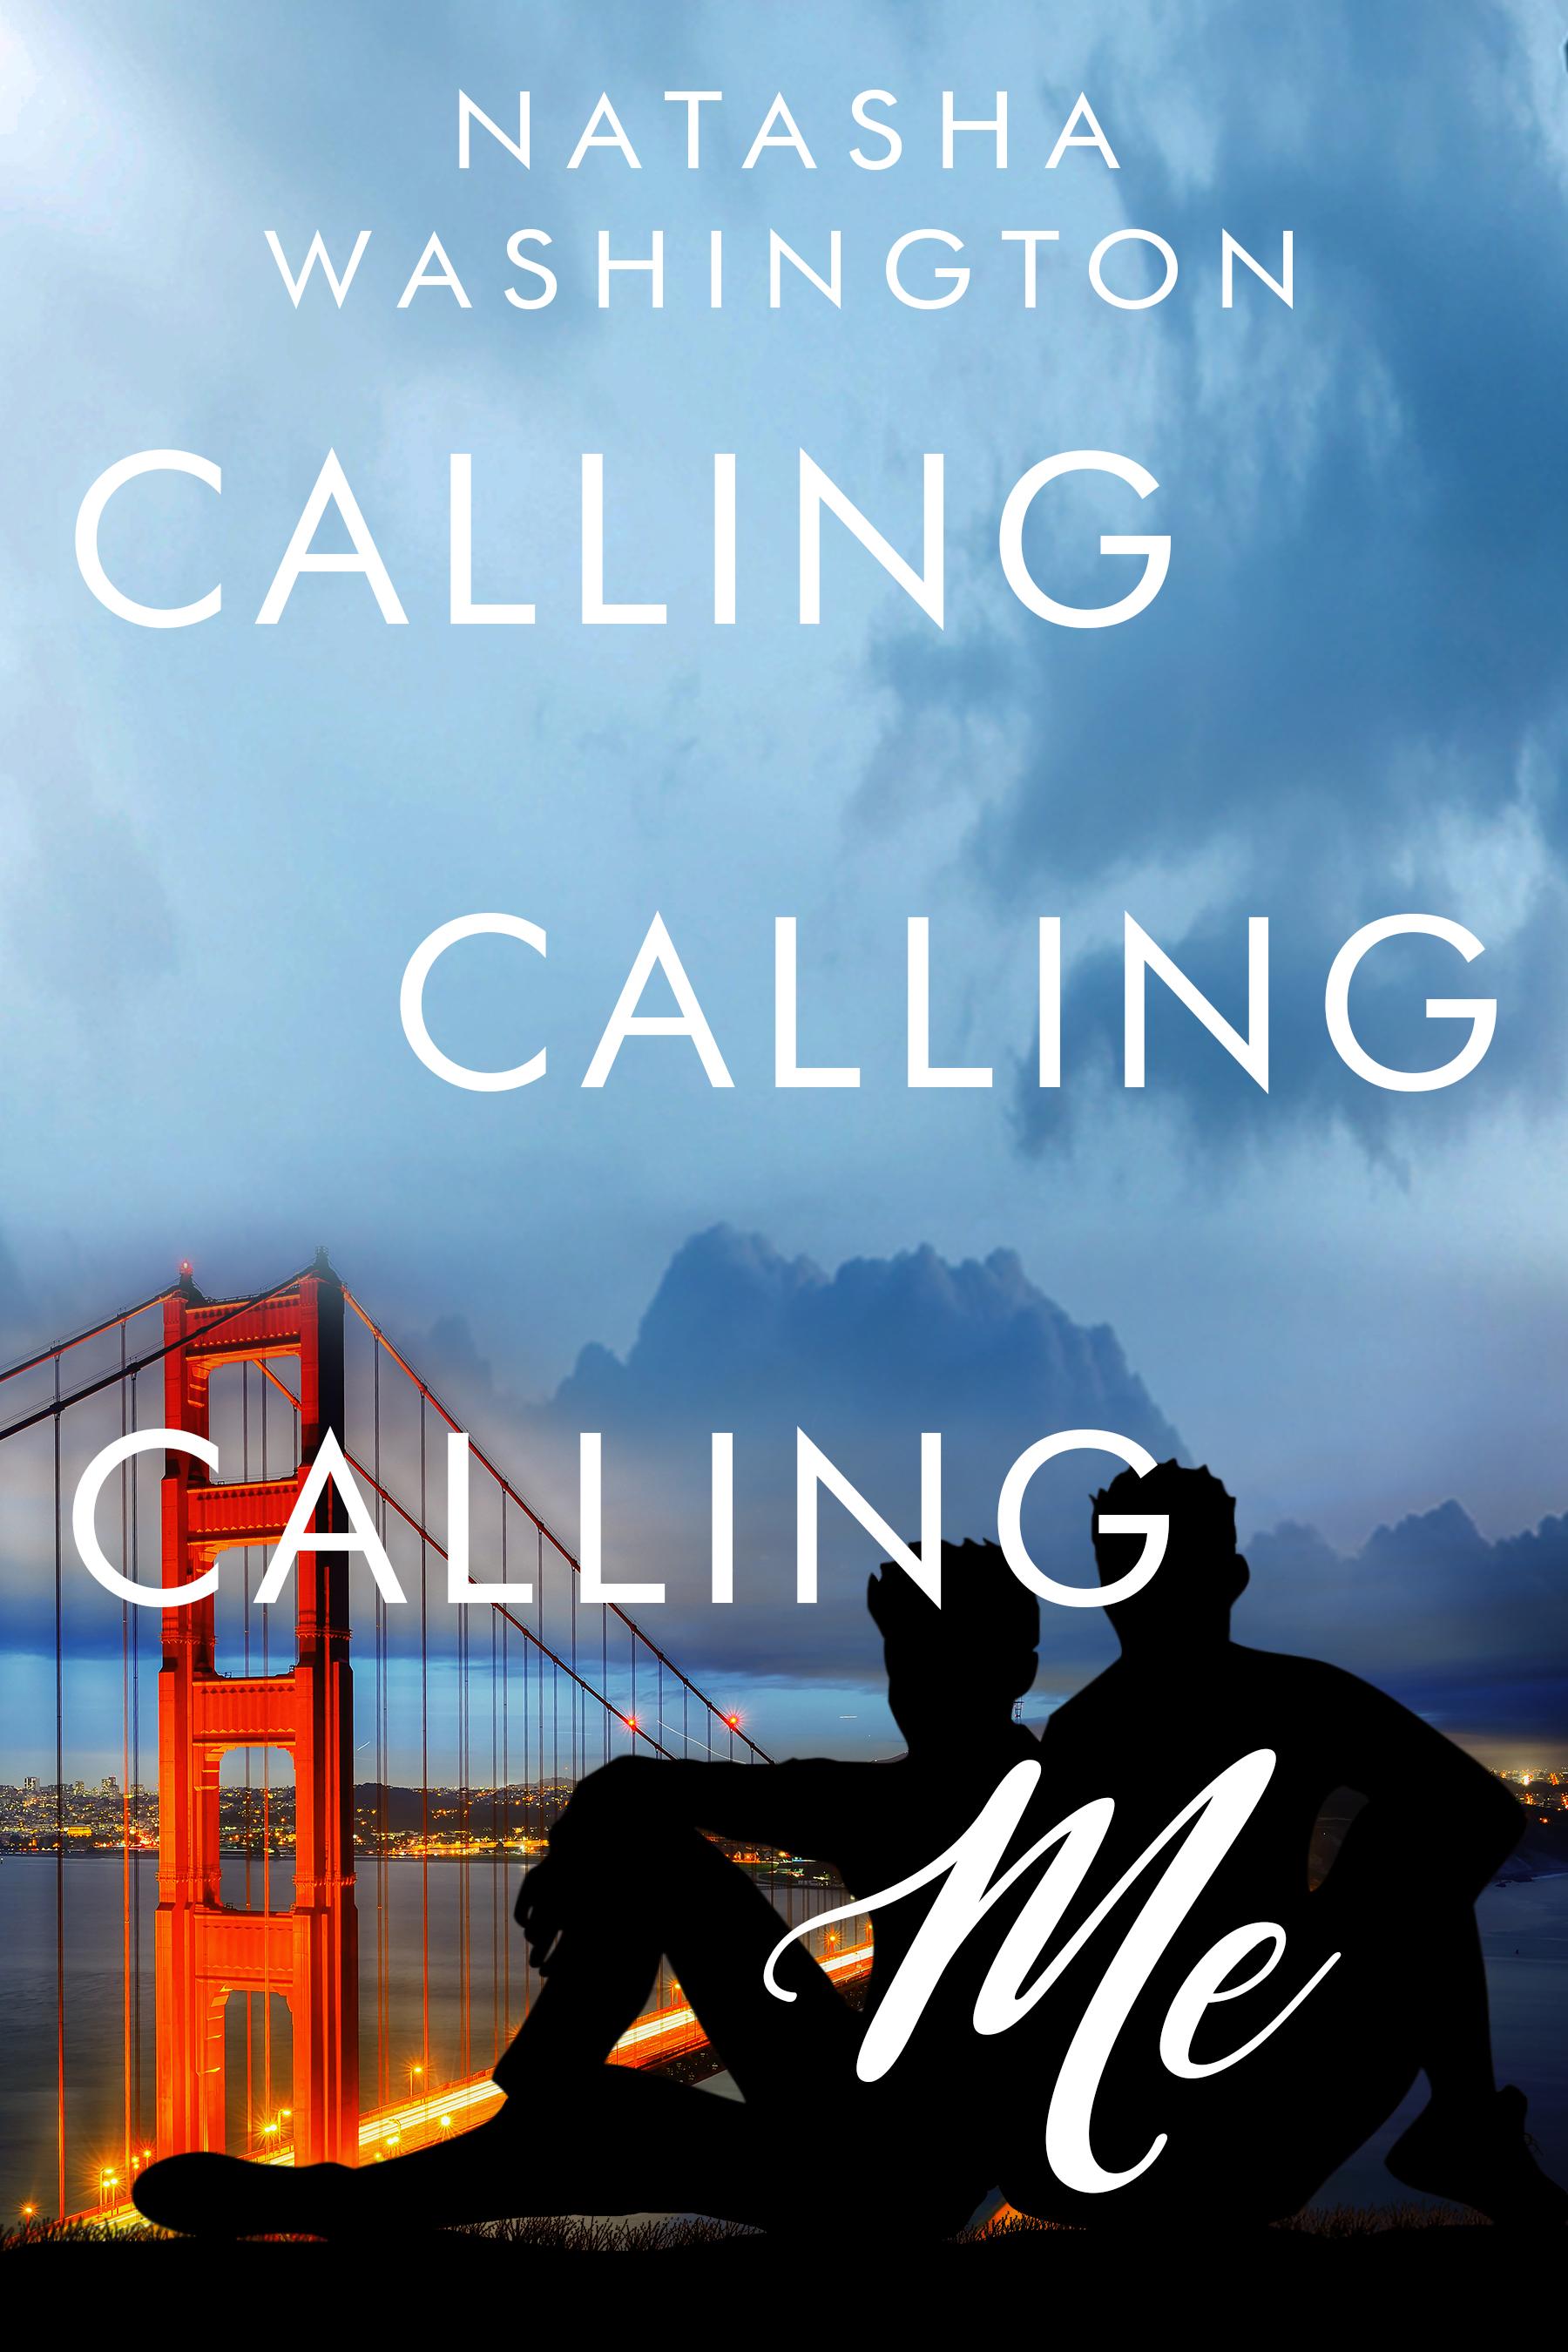 natasha washington, calling calling calling me